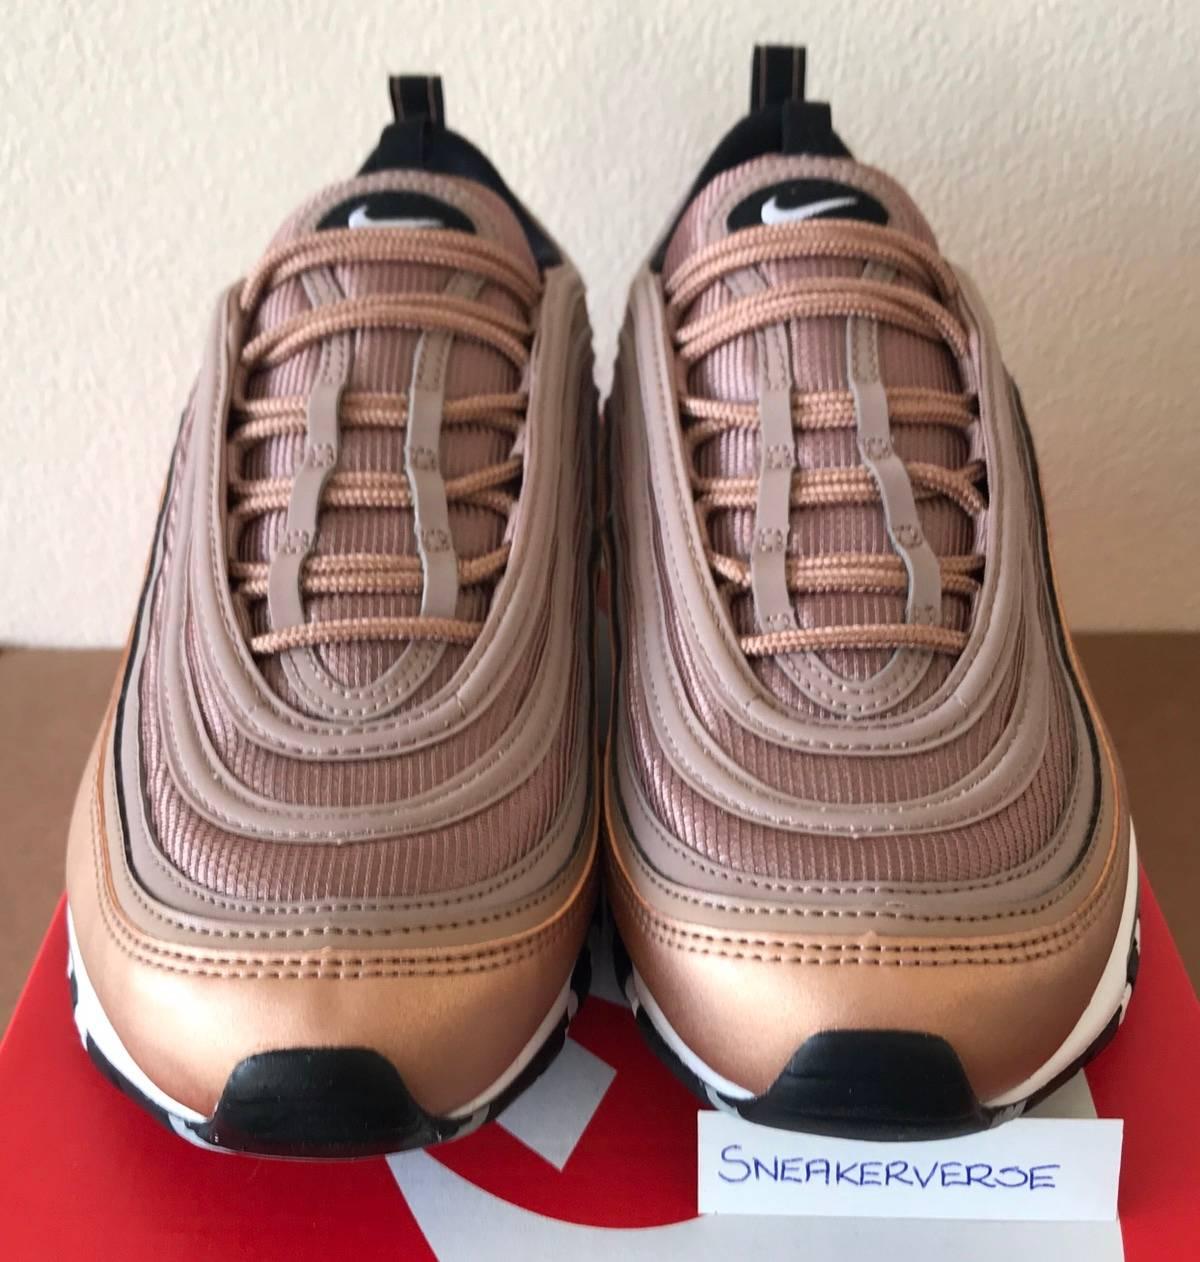 07b16752b019d Nike Nike Air Max 97 'Desert Dust' 921826 200 Metallic Bronze Size 10.5 $315